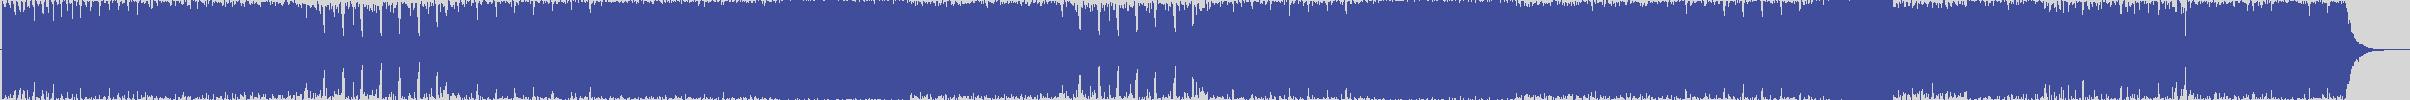 smilax_dig_records [Smilax_X448DIG] Bra Zil, Mitiko - Galera [Milk Radio Edit] audio wave form